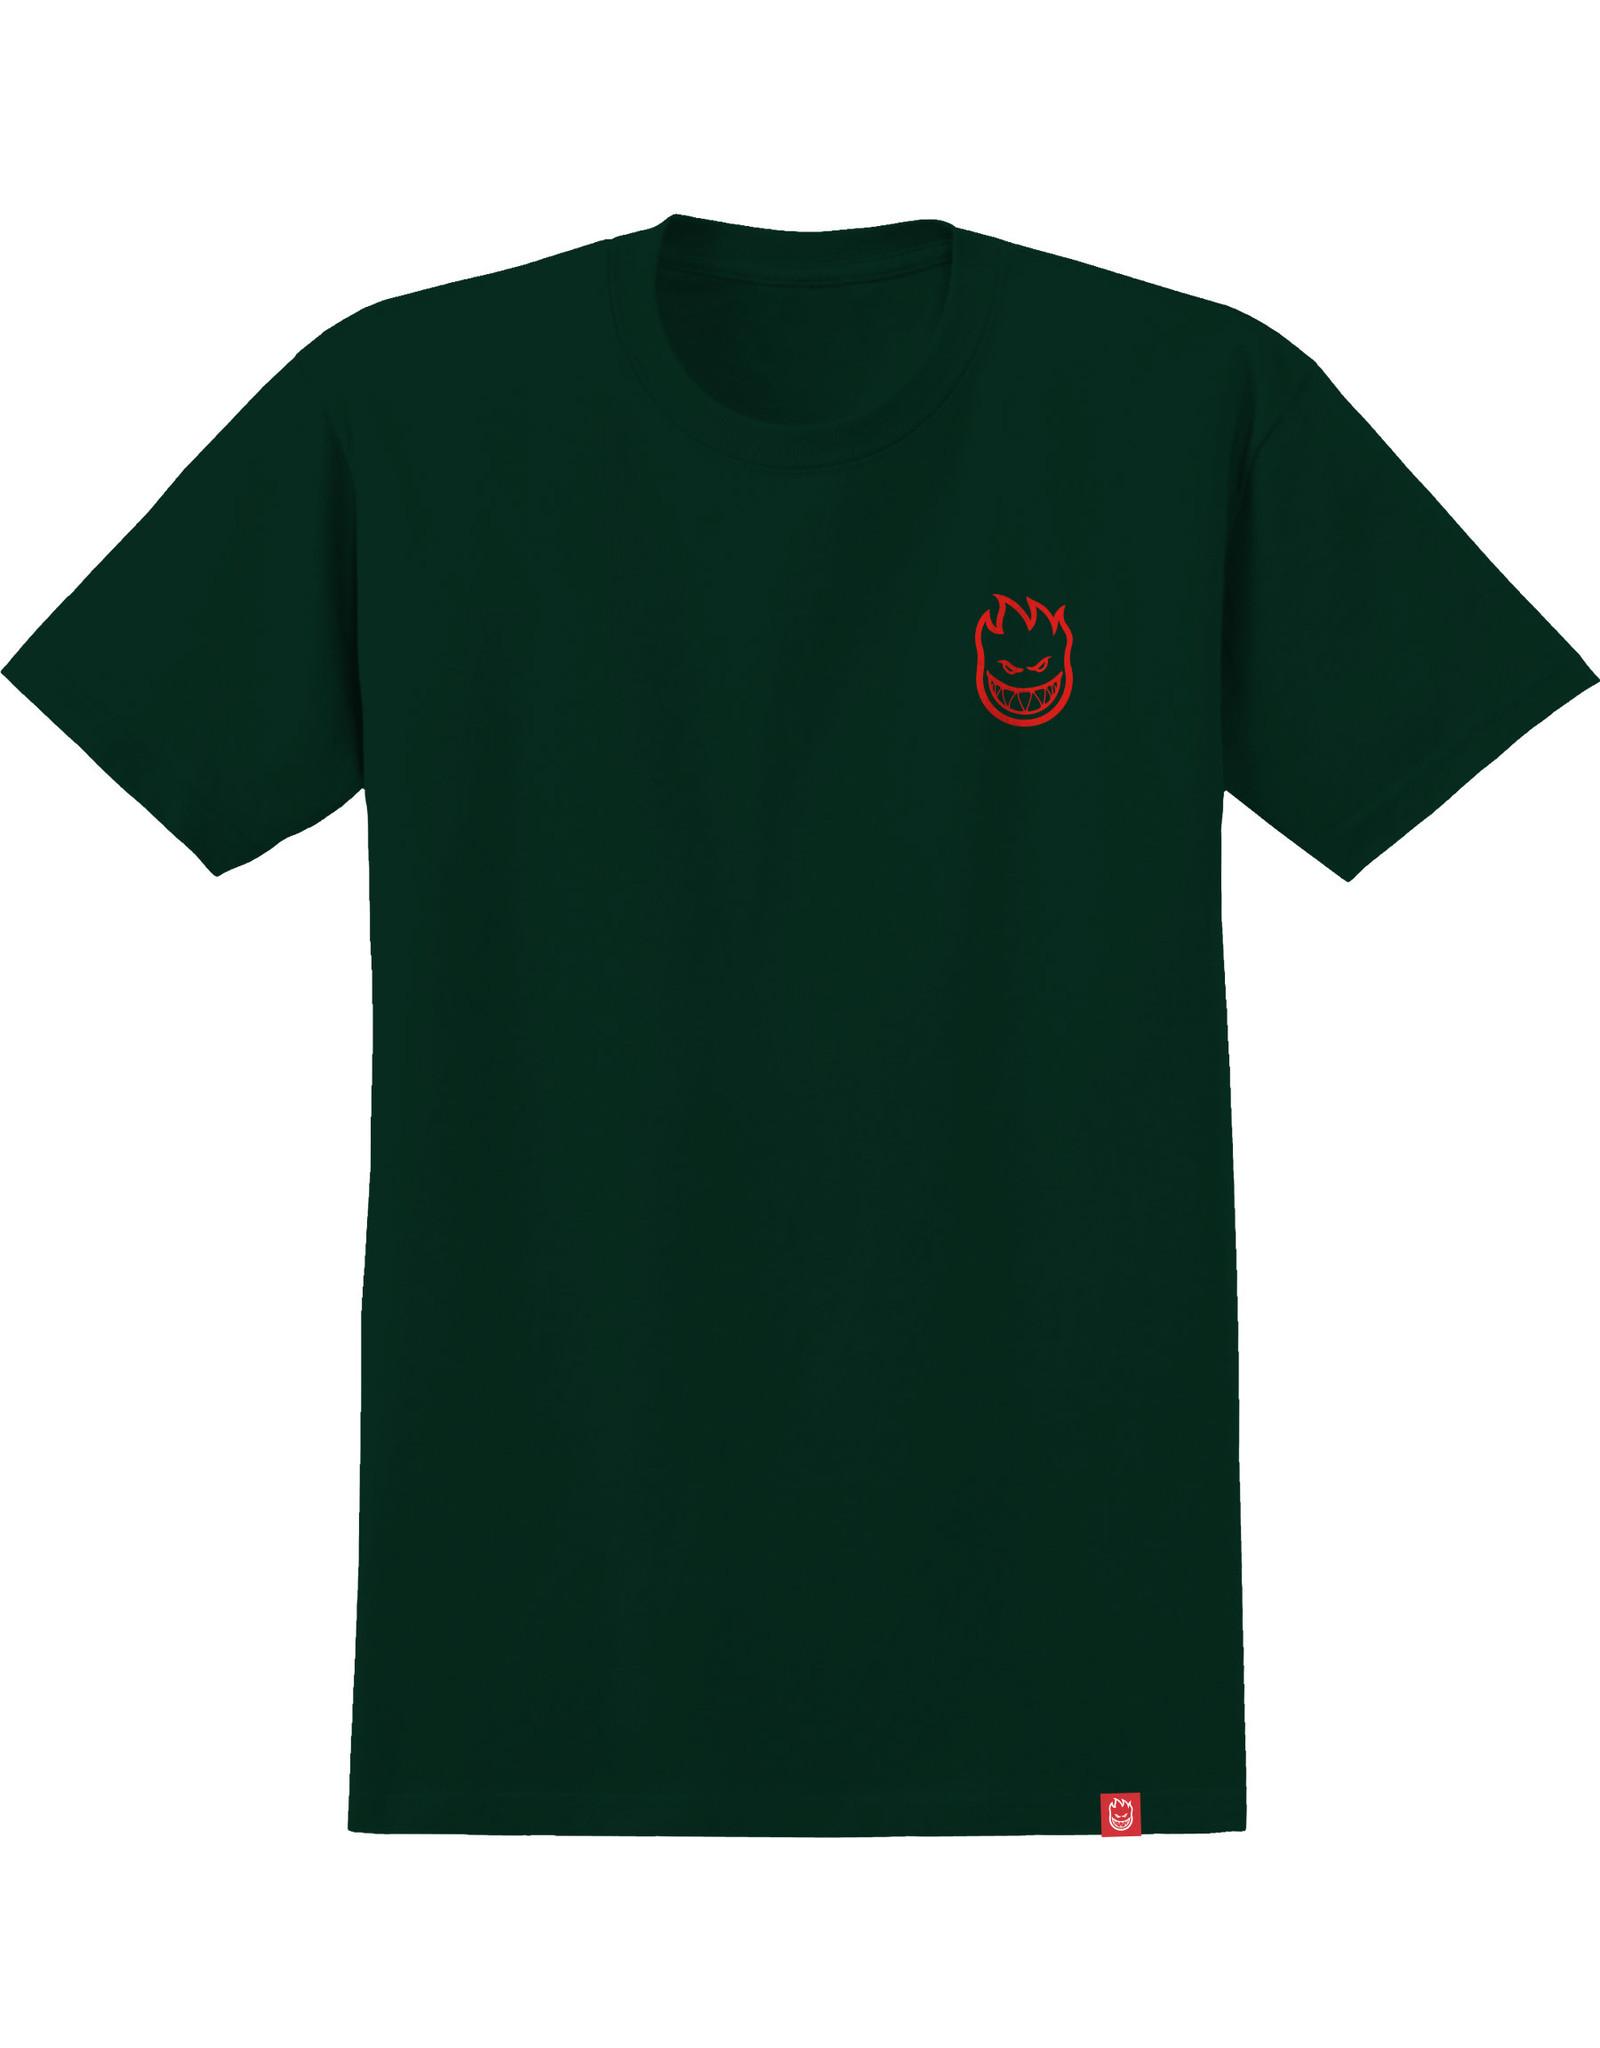 spitfire Spitfire - T-shirt homme lil big head forest green w/red print